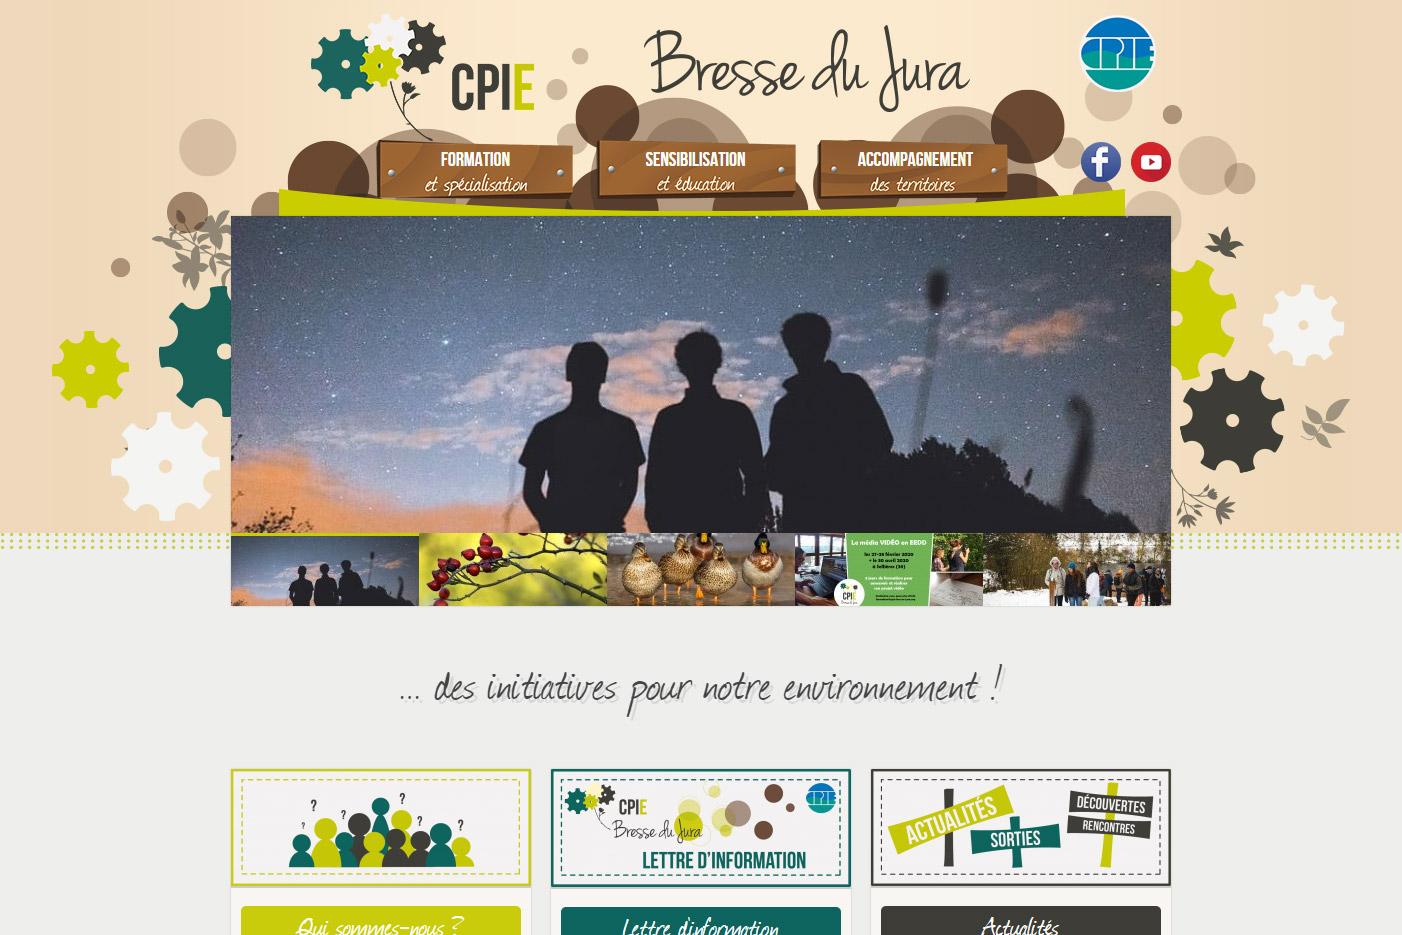 CPIE Bresse Jura